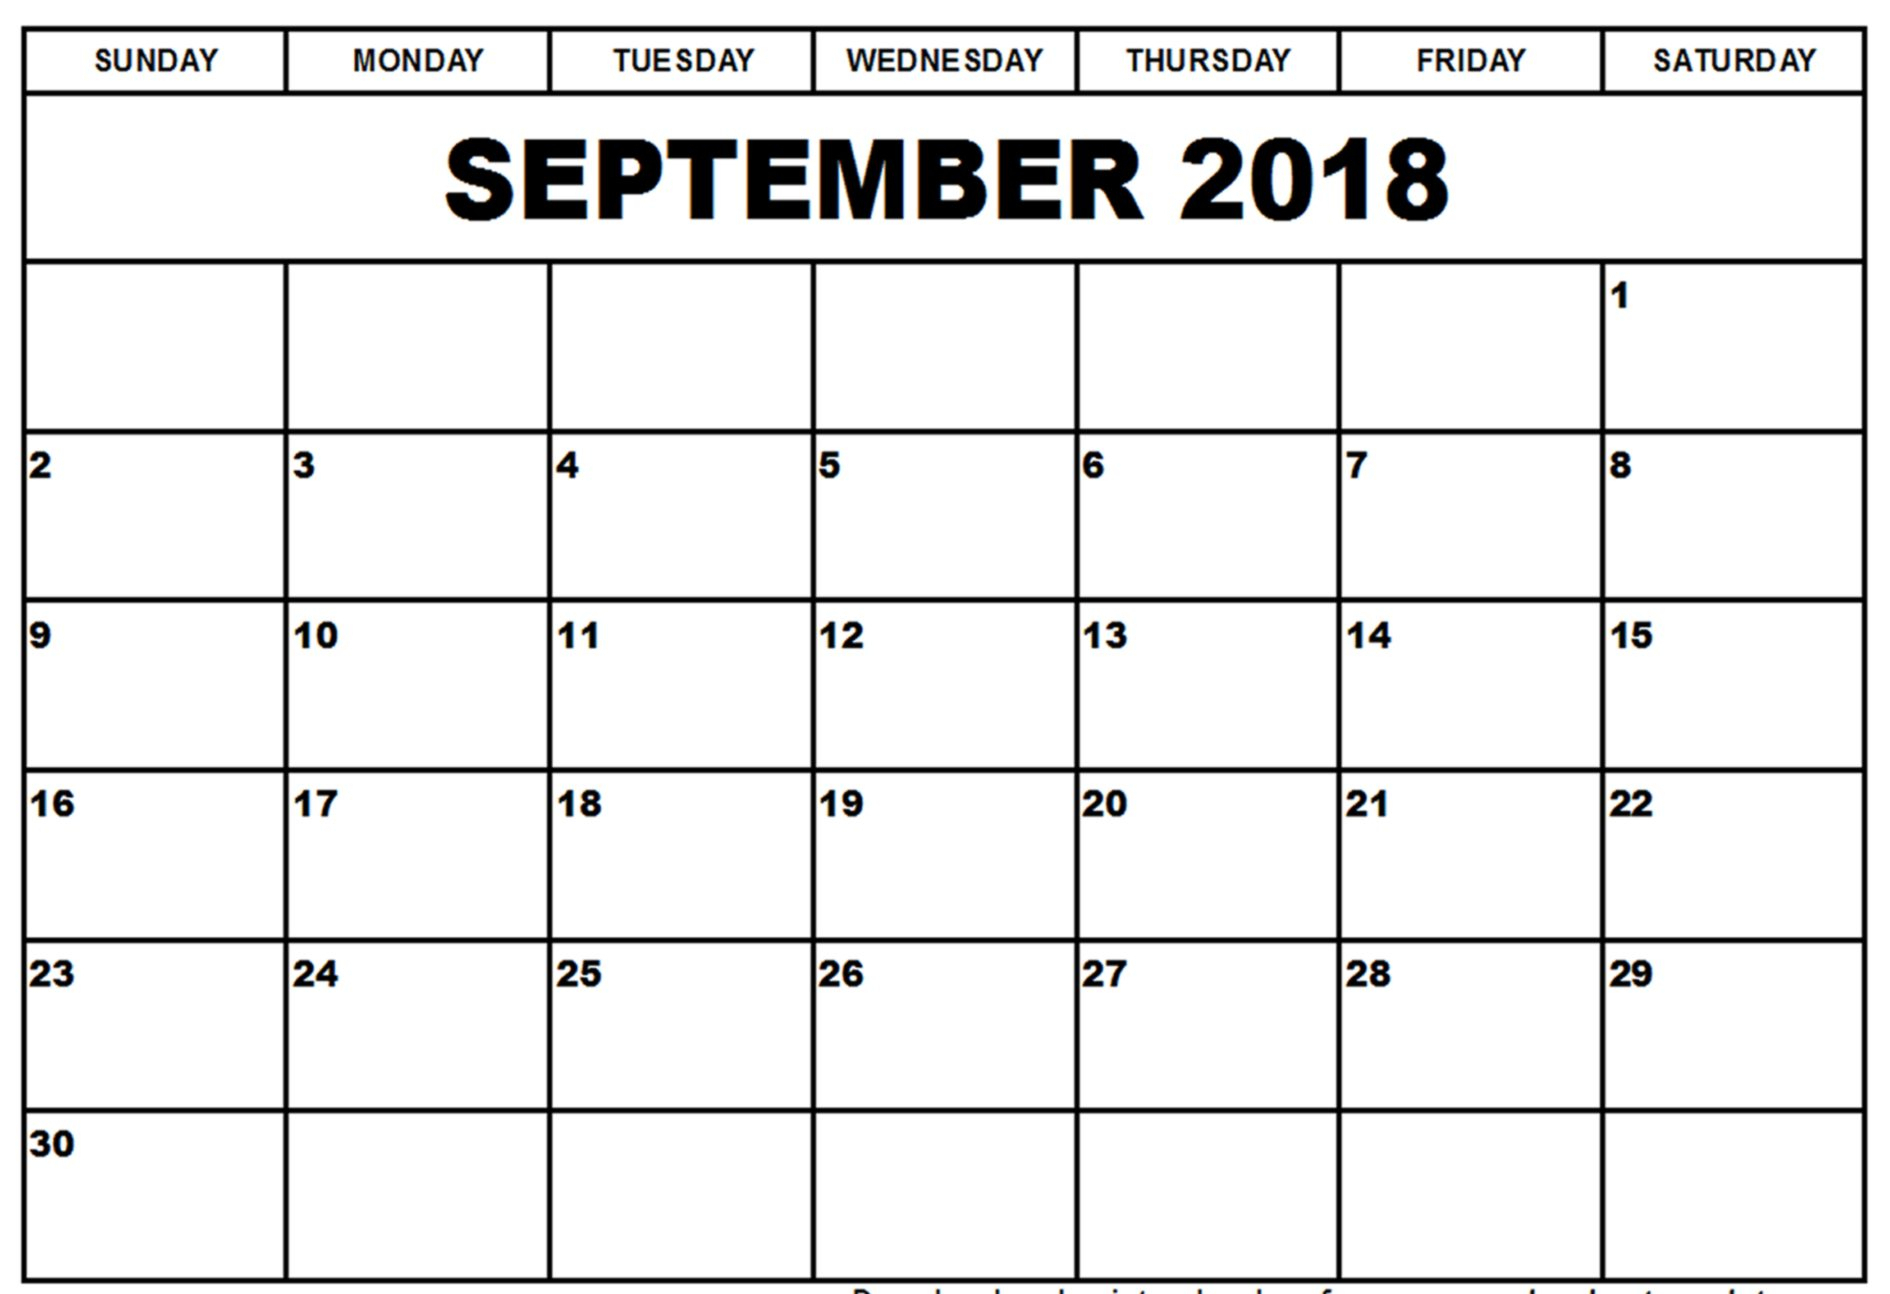 Printable Calendar September 2018 Template Pdf intended for September Calendar Printable Template